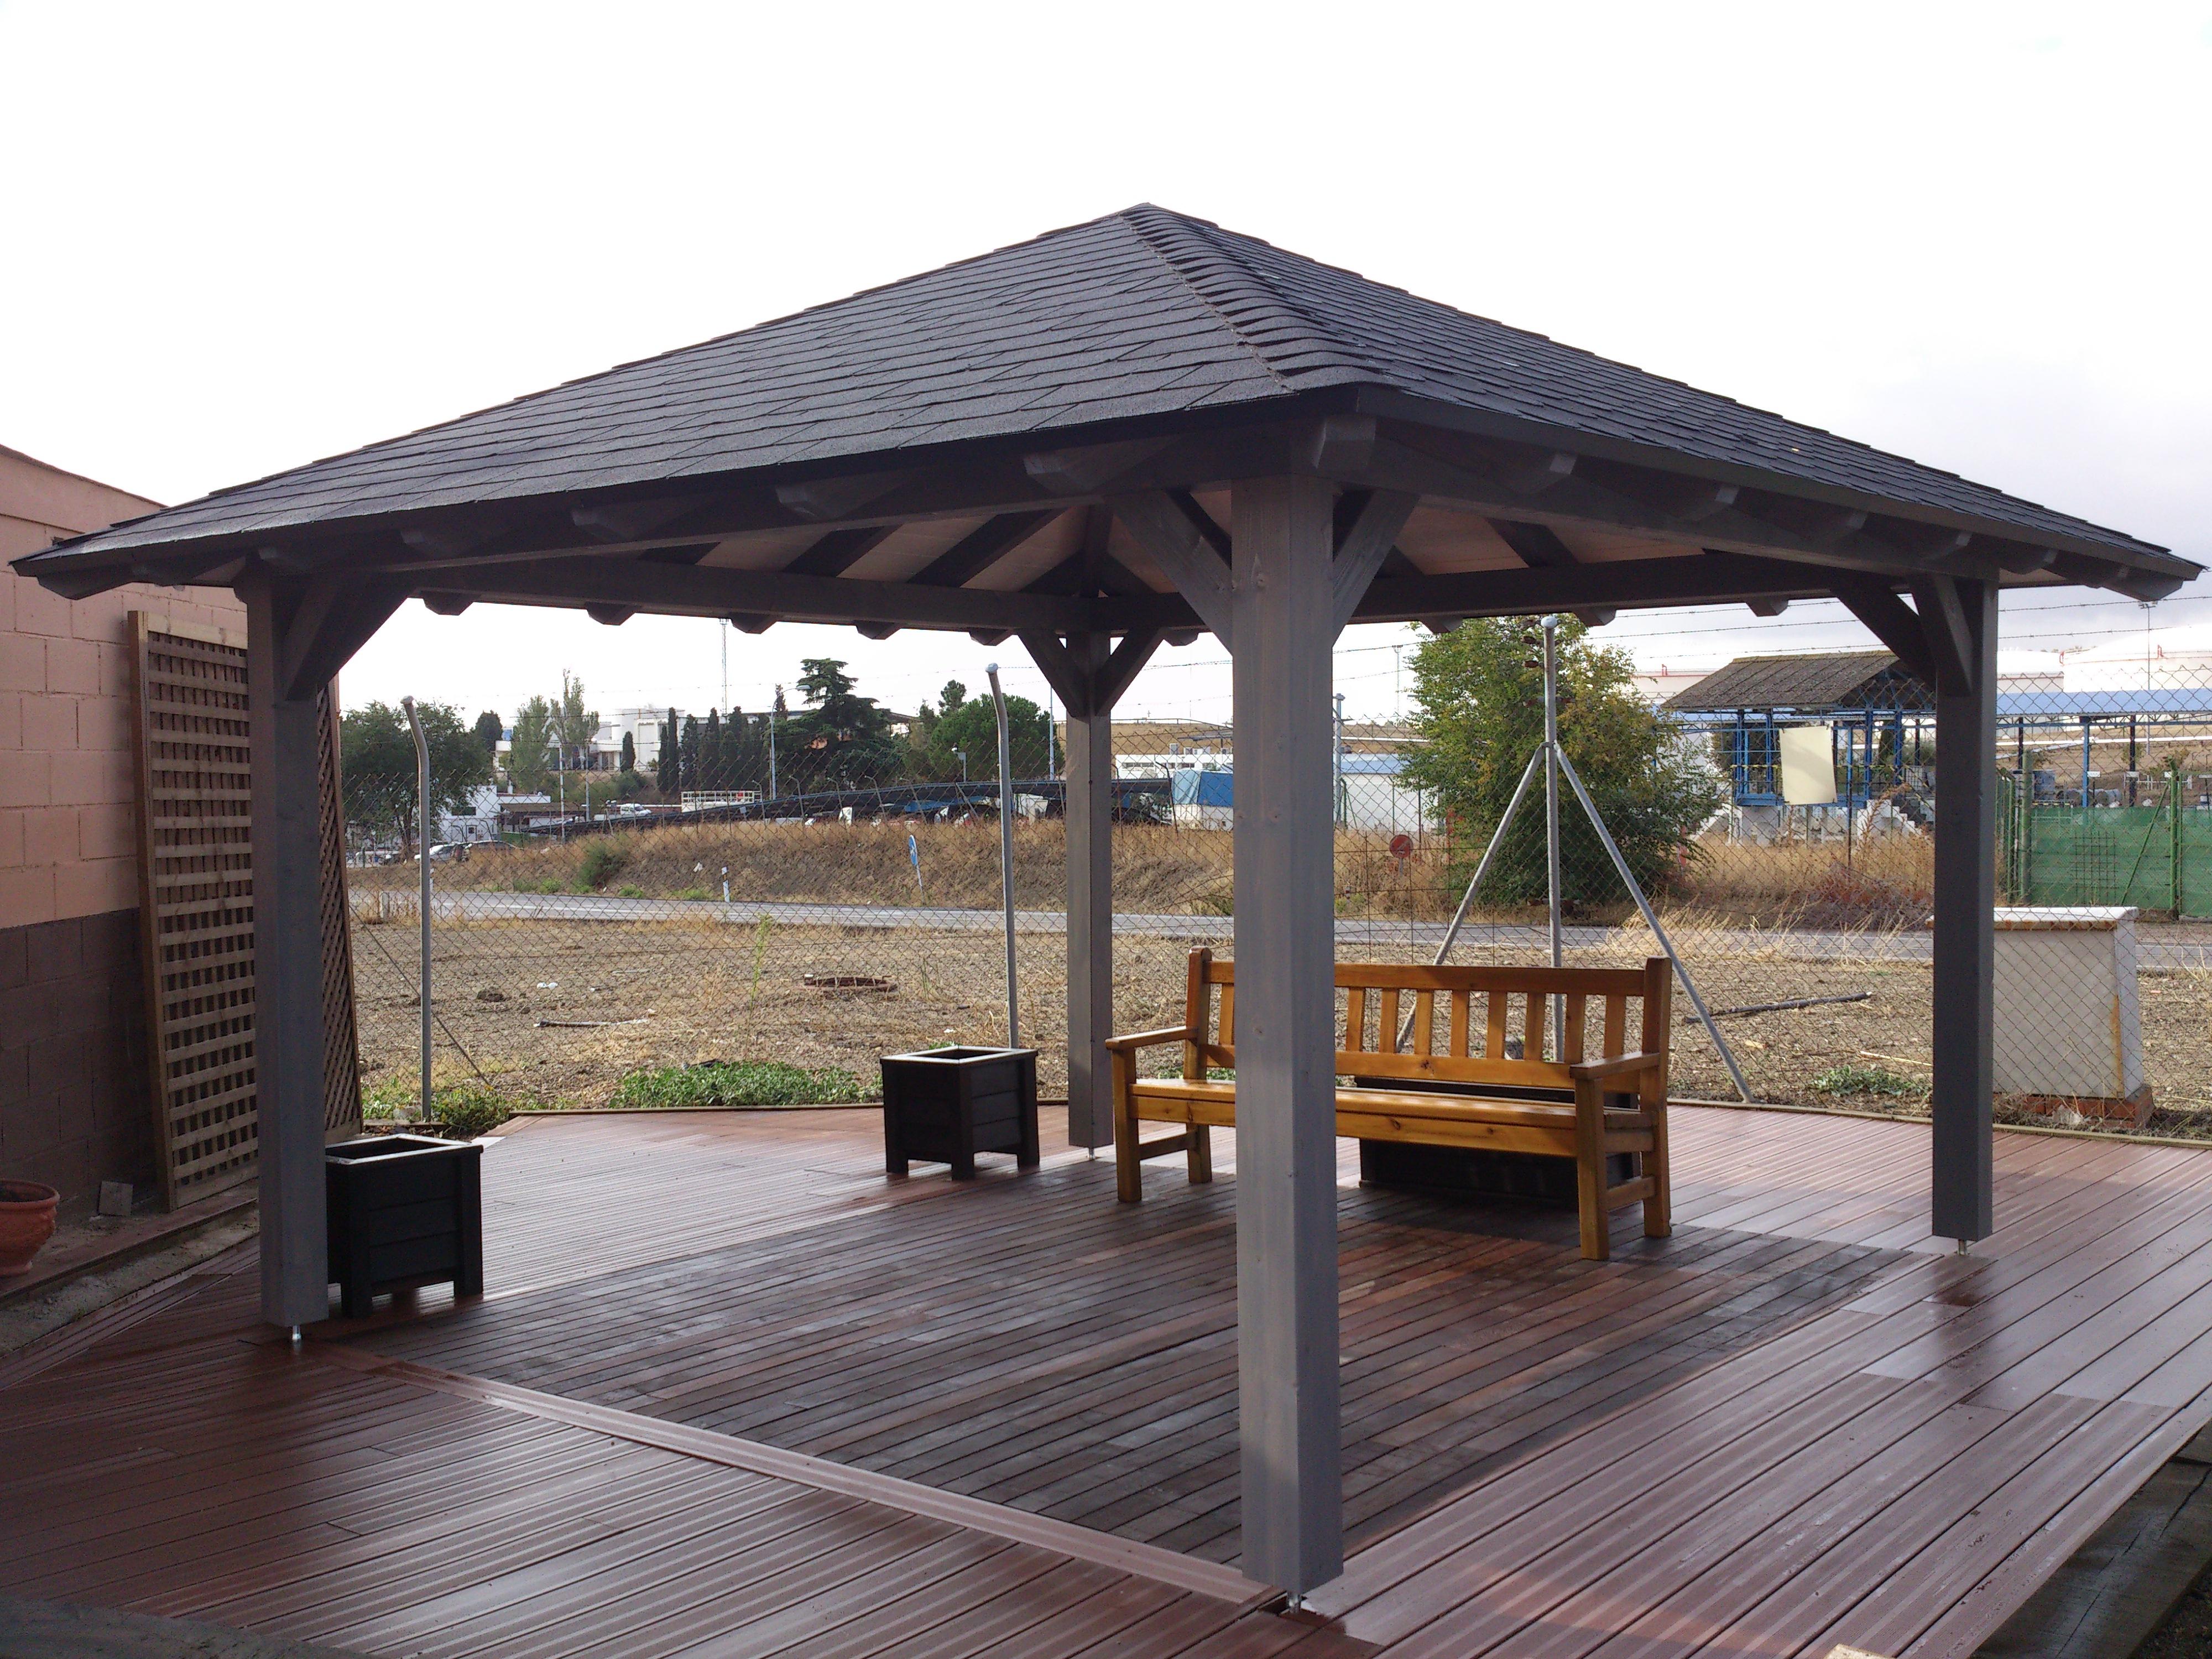 Cenador de madera proyectos construcci n casas for Cenadores de madera para jardin